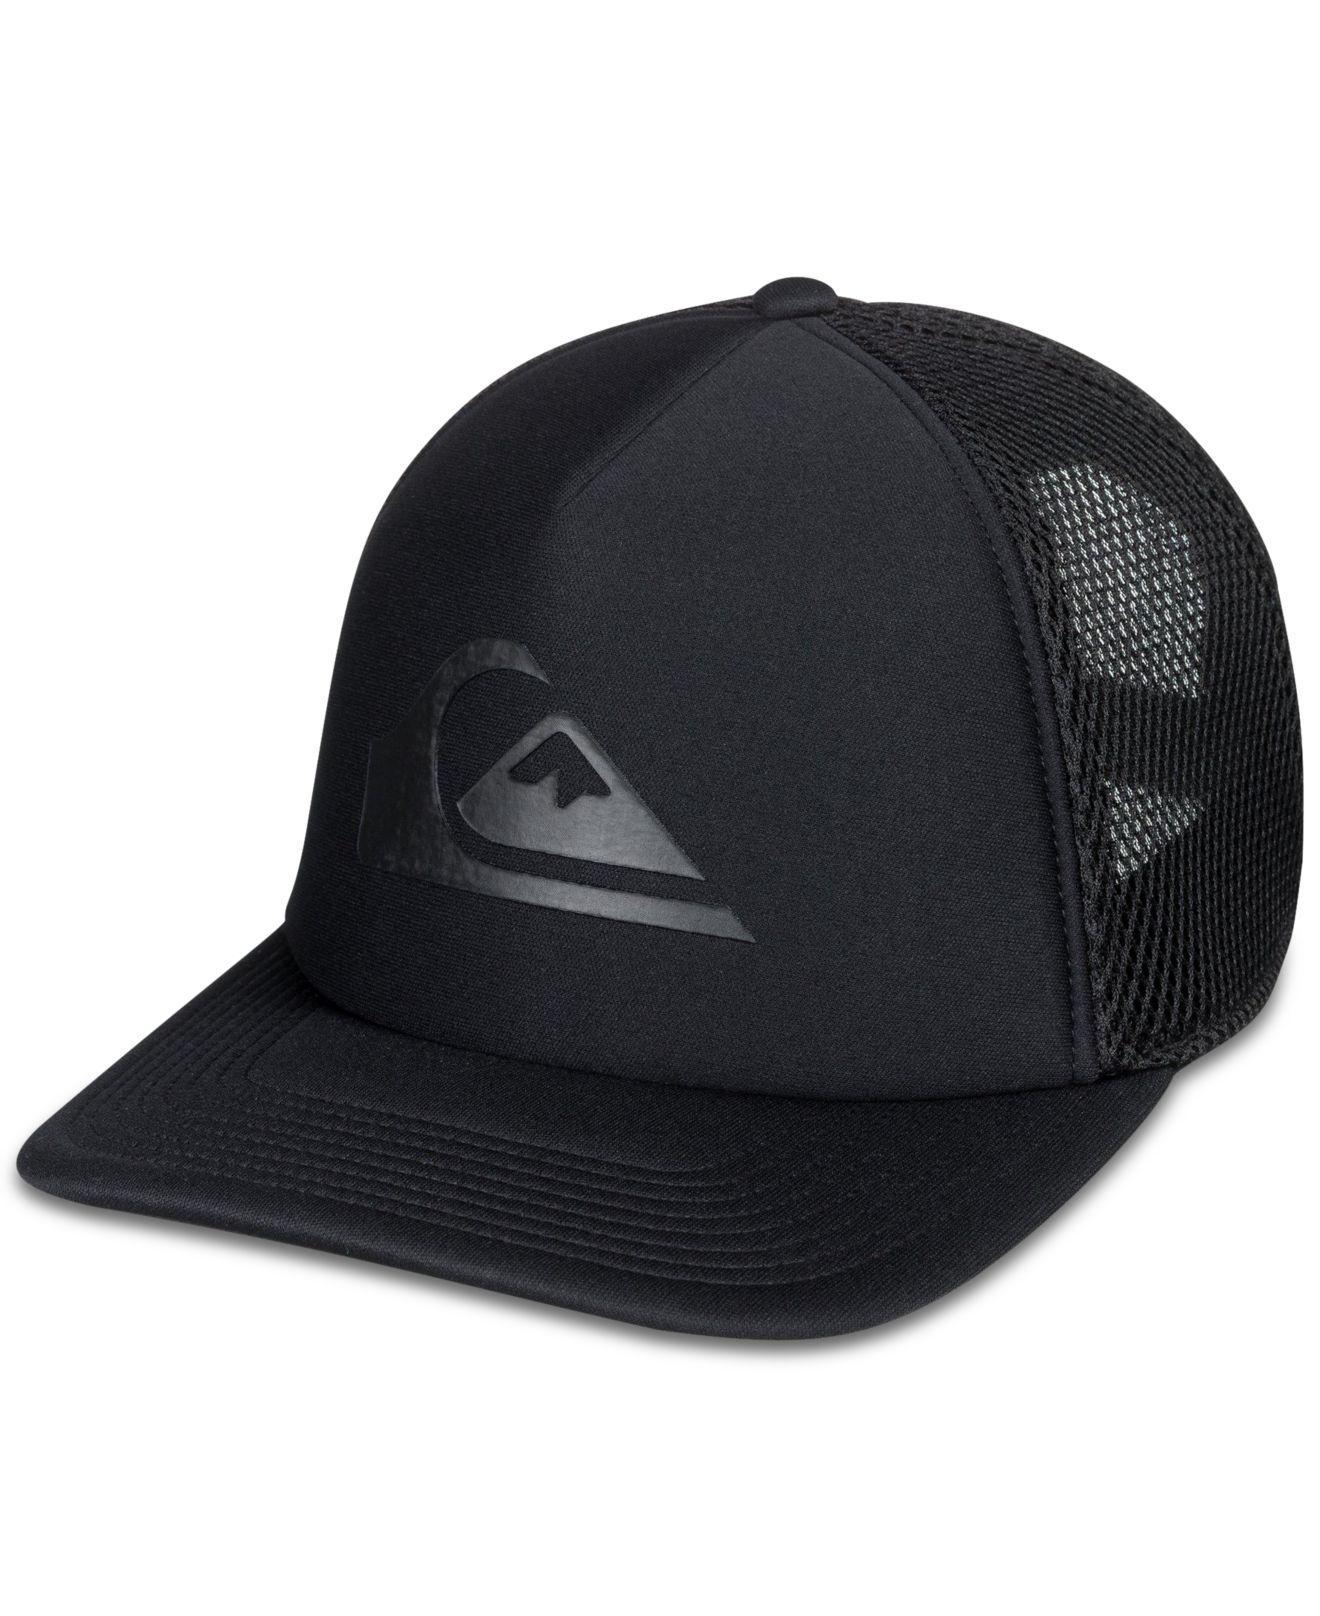 Lyst - Quiksilver All Bent Up Hat in Black for Men 51565210411